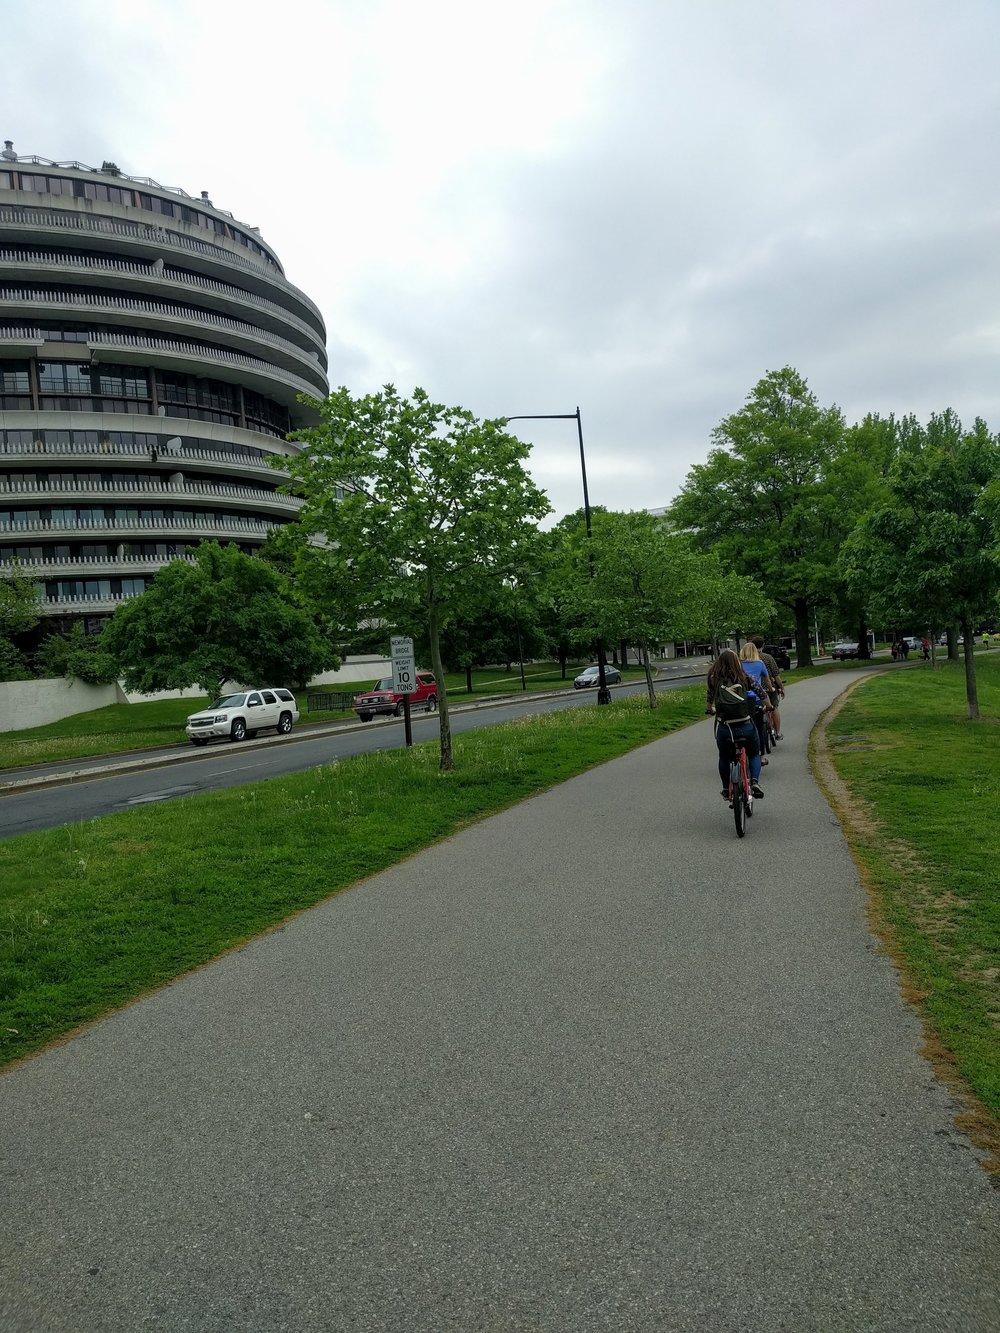 Riding bikes past Watergate!